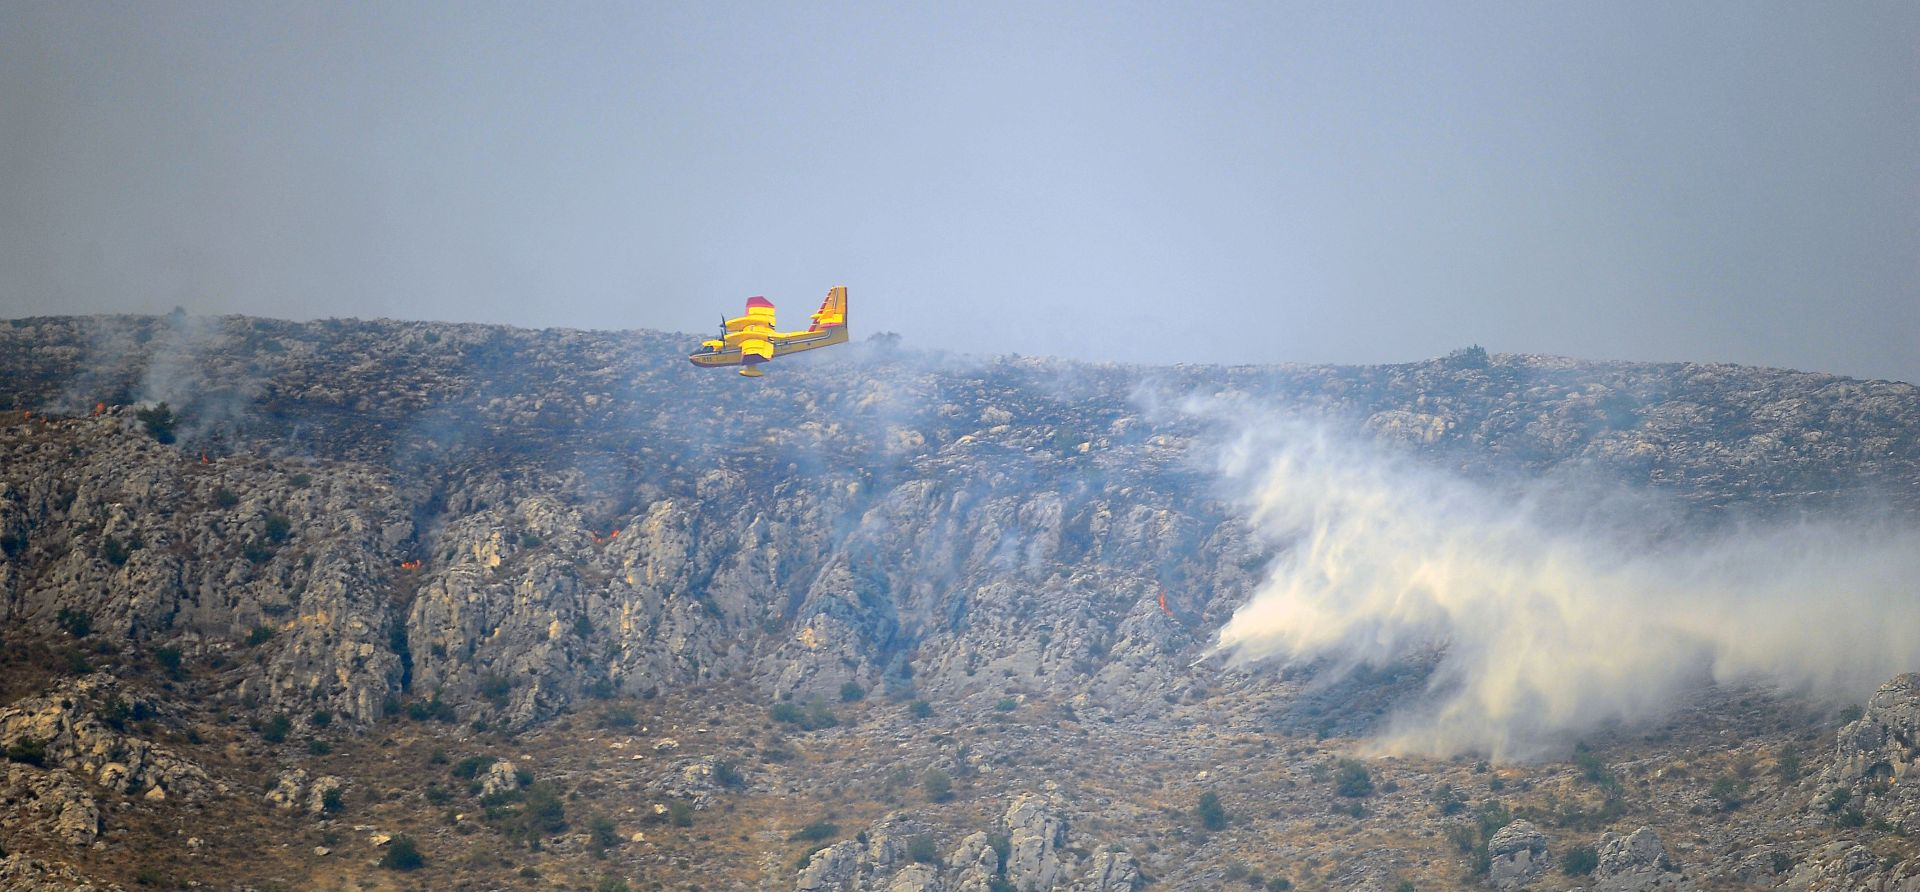 Gorjelo u Šibensko-kninskoj županiji, kod Drniša požar lokaliziran